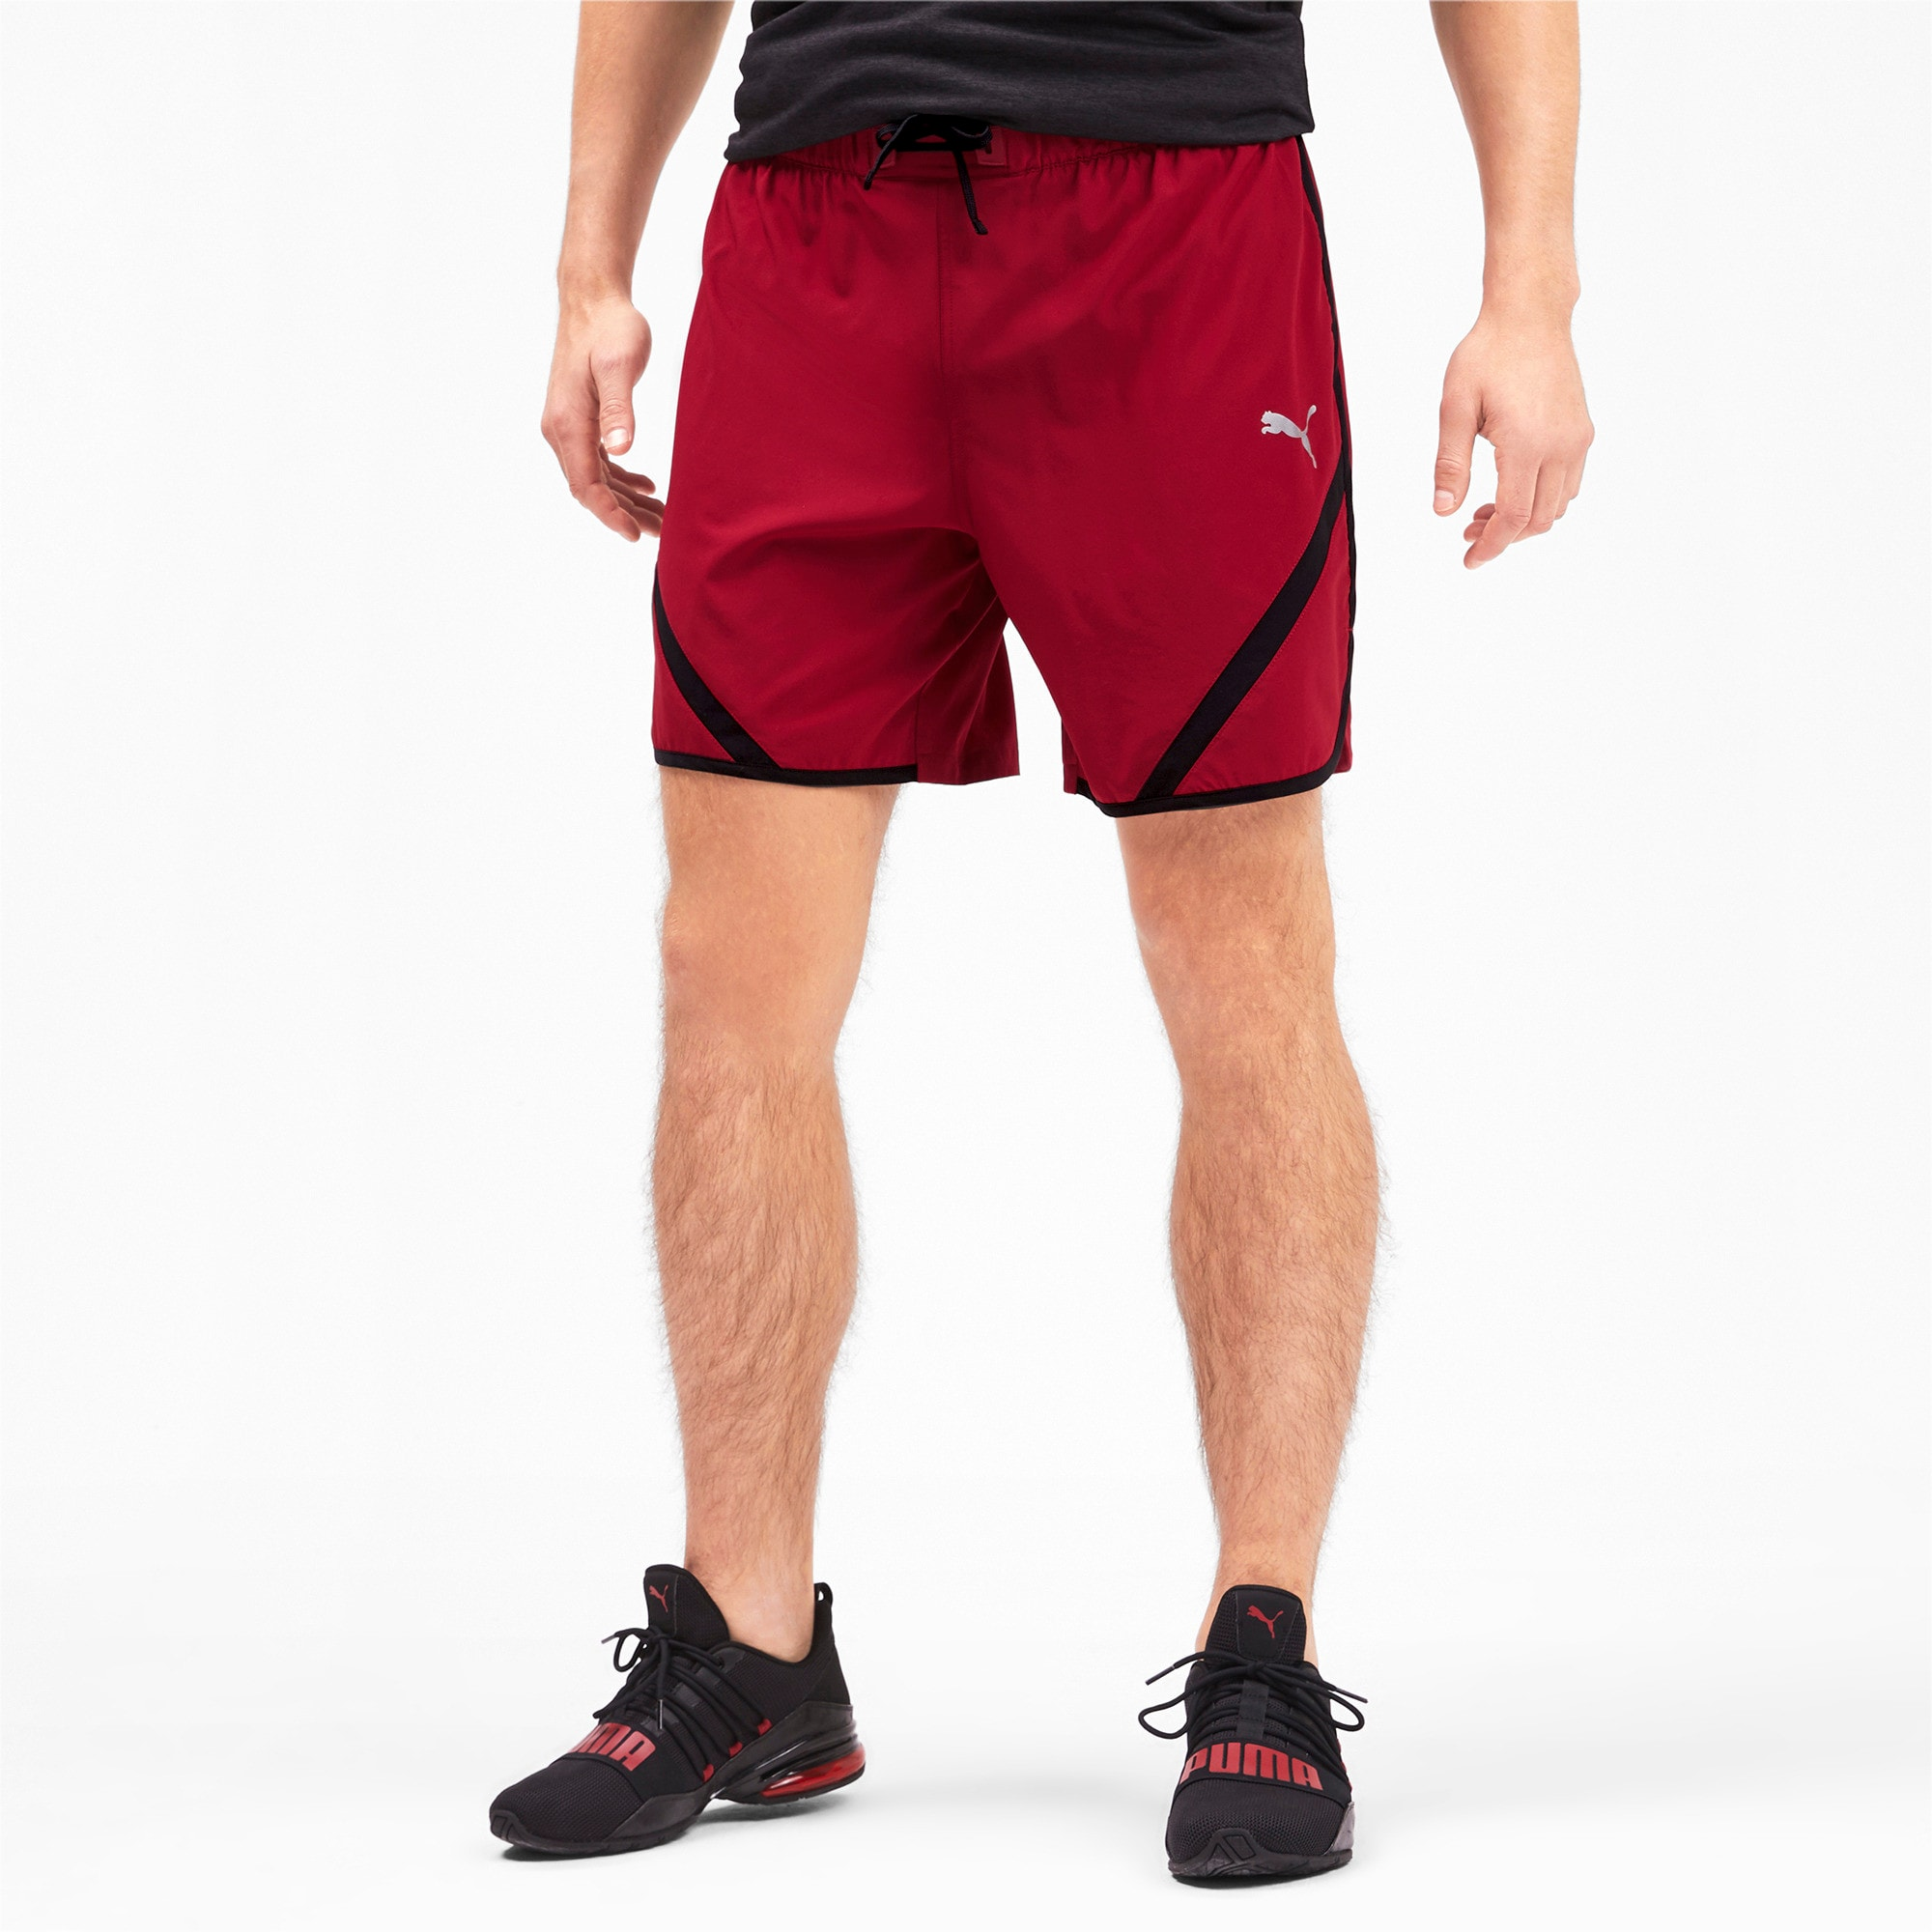 Thumbnail 1 of Get Fast Men's Shorts, Rhubarb-Puma Black, medium